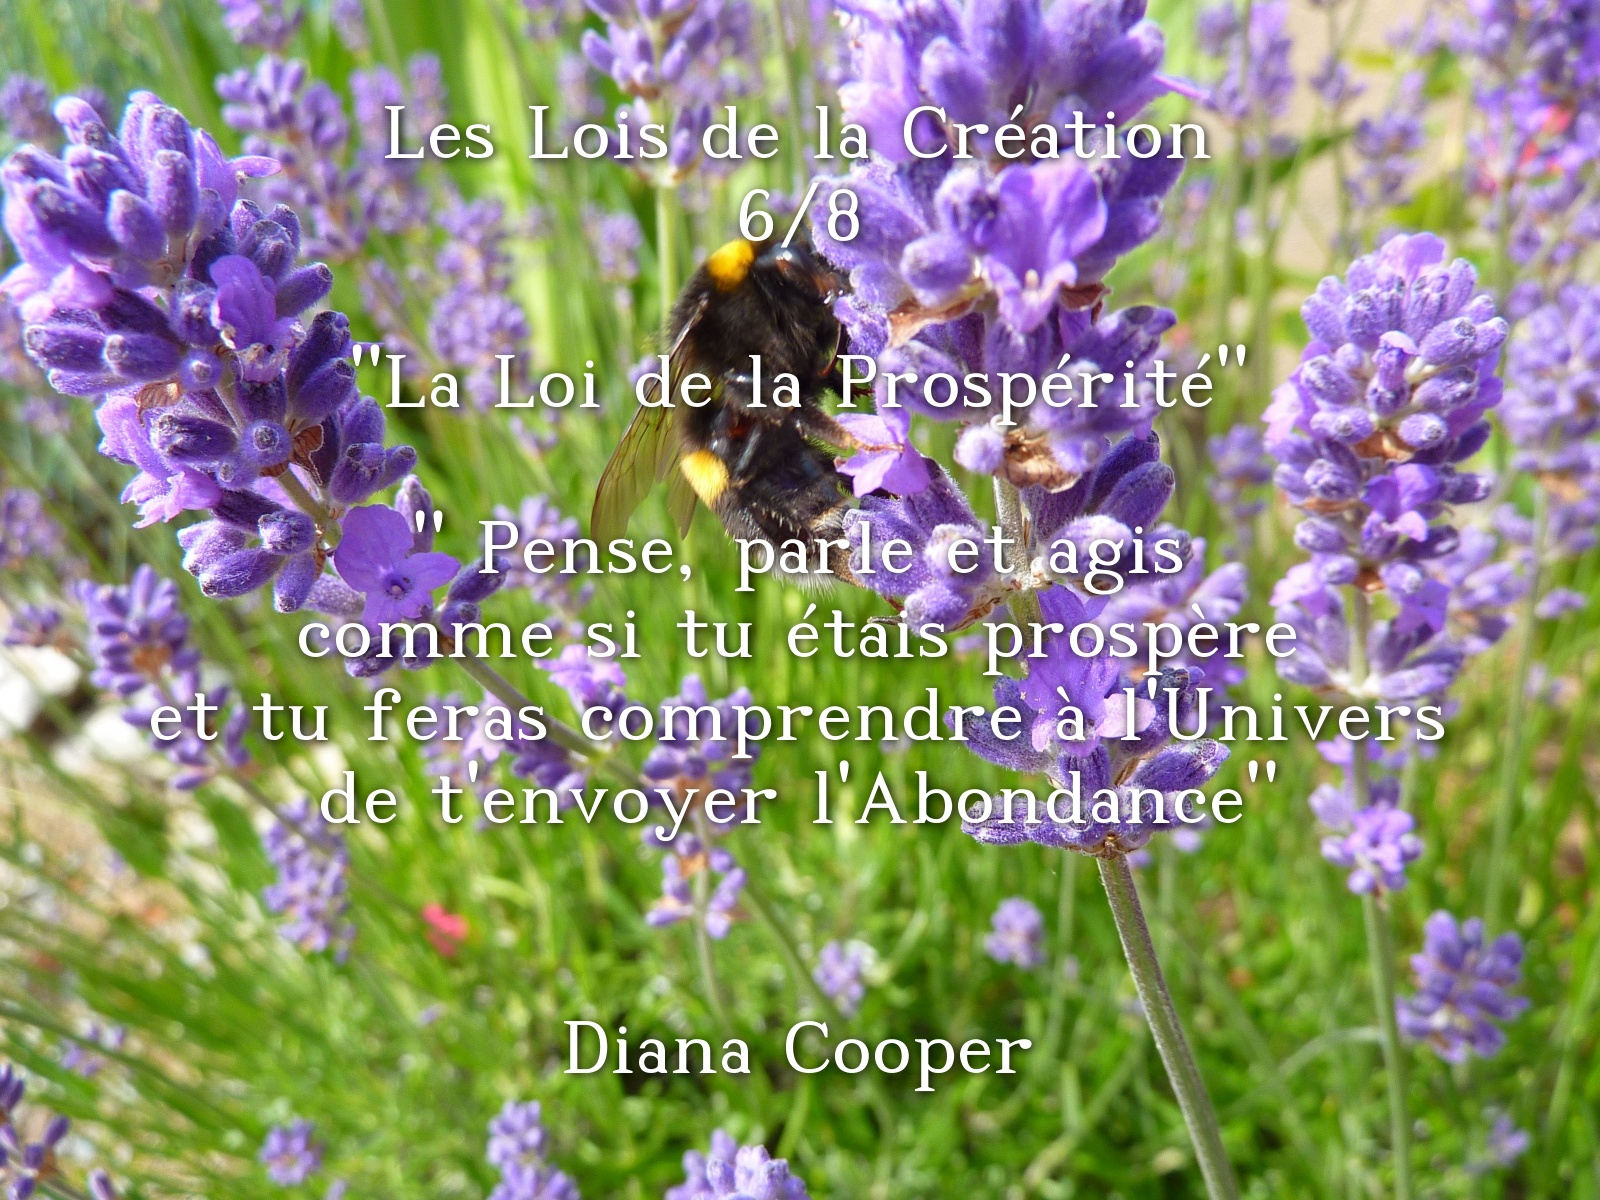 wp-Les-Lois-de-la-Cr-ation-6-8-La-Loi-de-la_1537861448